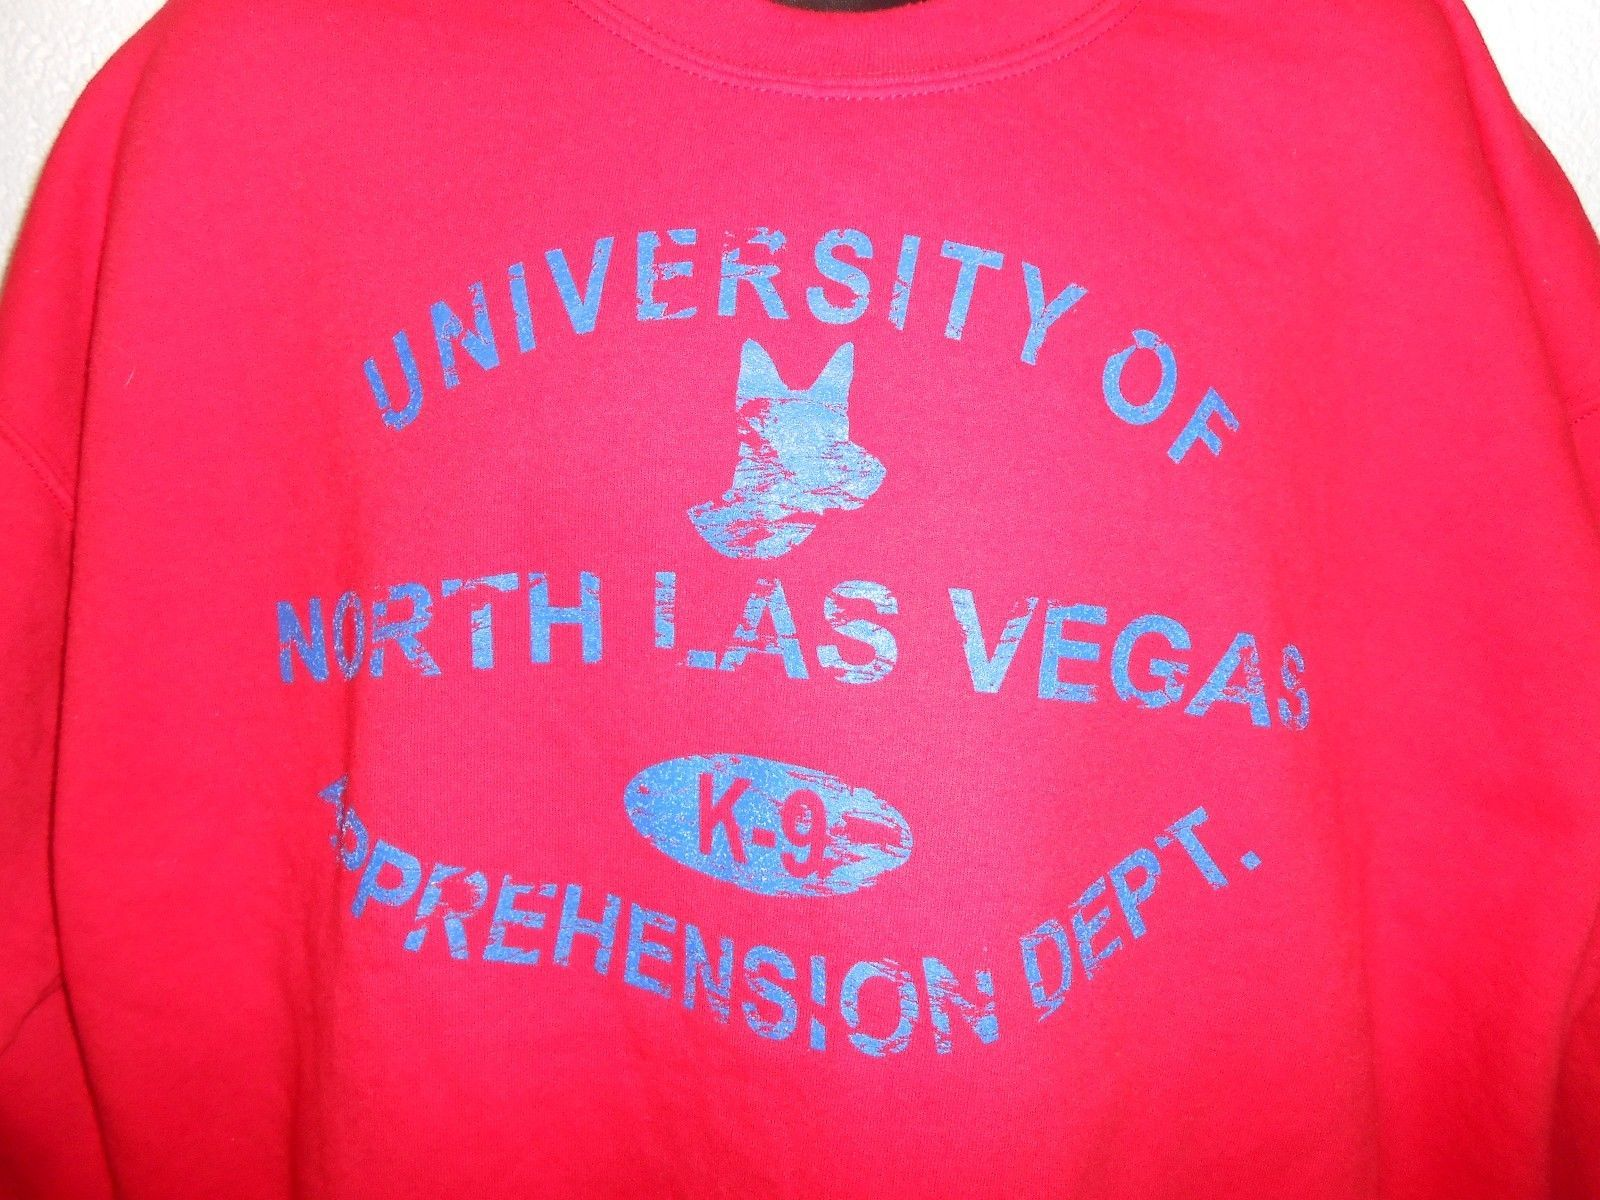 University of North Las Vegas K-9 Apprehension Dept. Sweatshirt XL